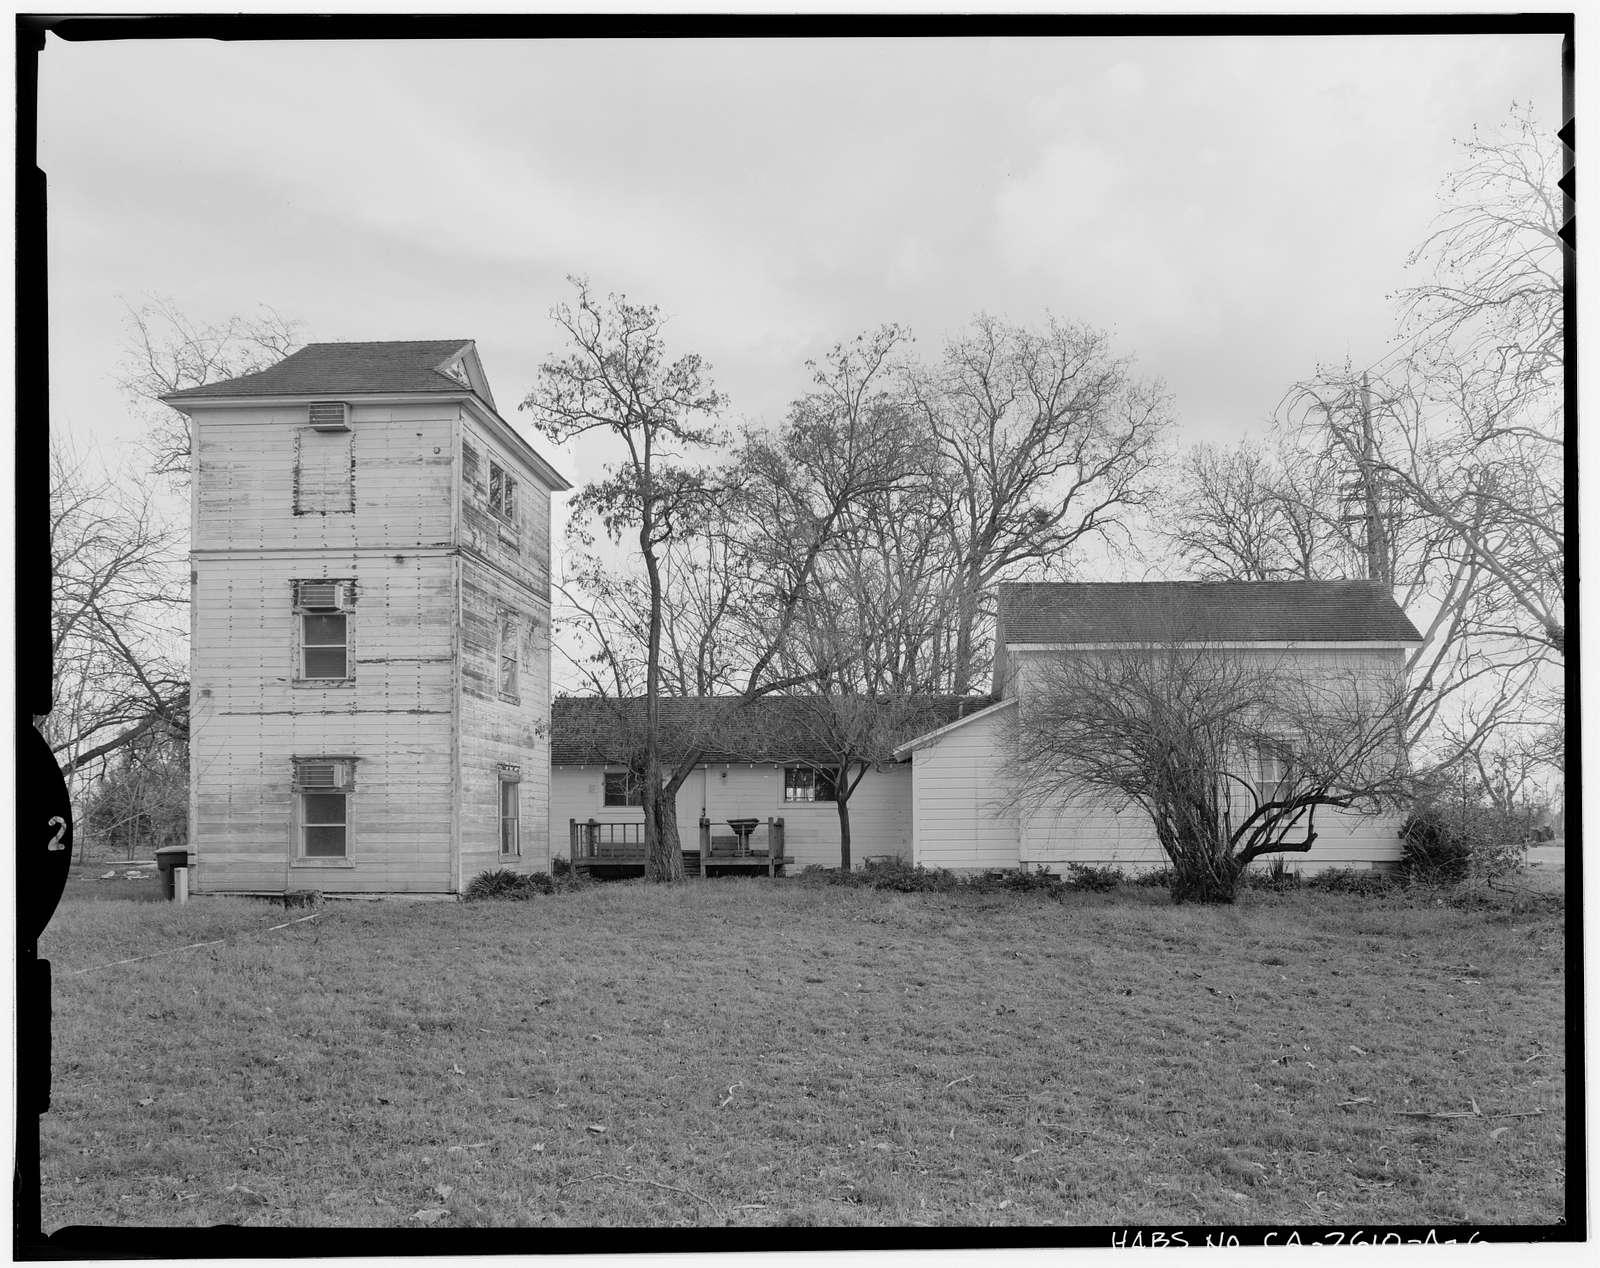 Drew-Sherwood Farm, House, 7927 Elk Grove Boulevard, Elk Grove, Sacramento County, CA